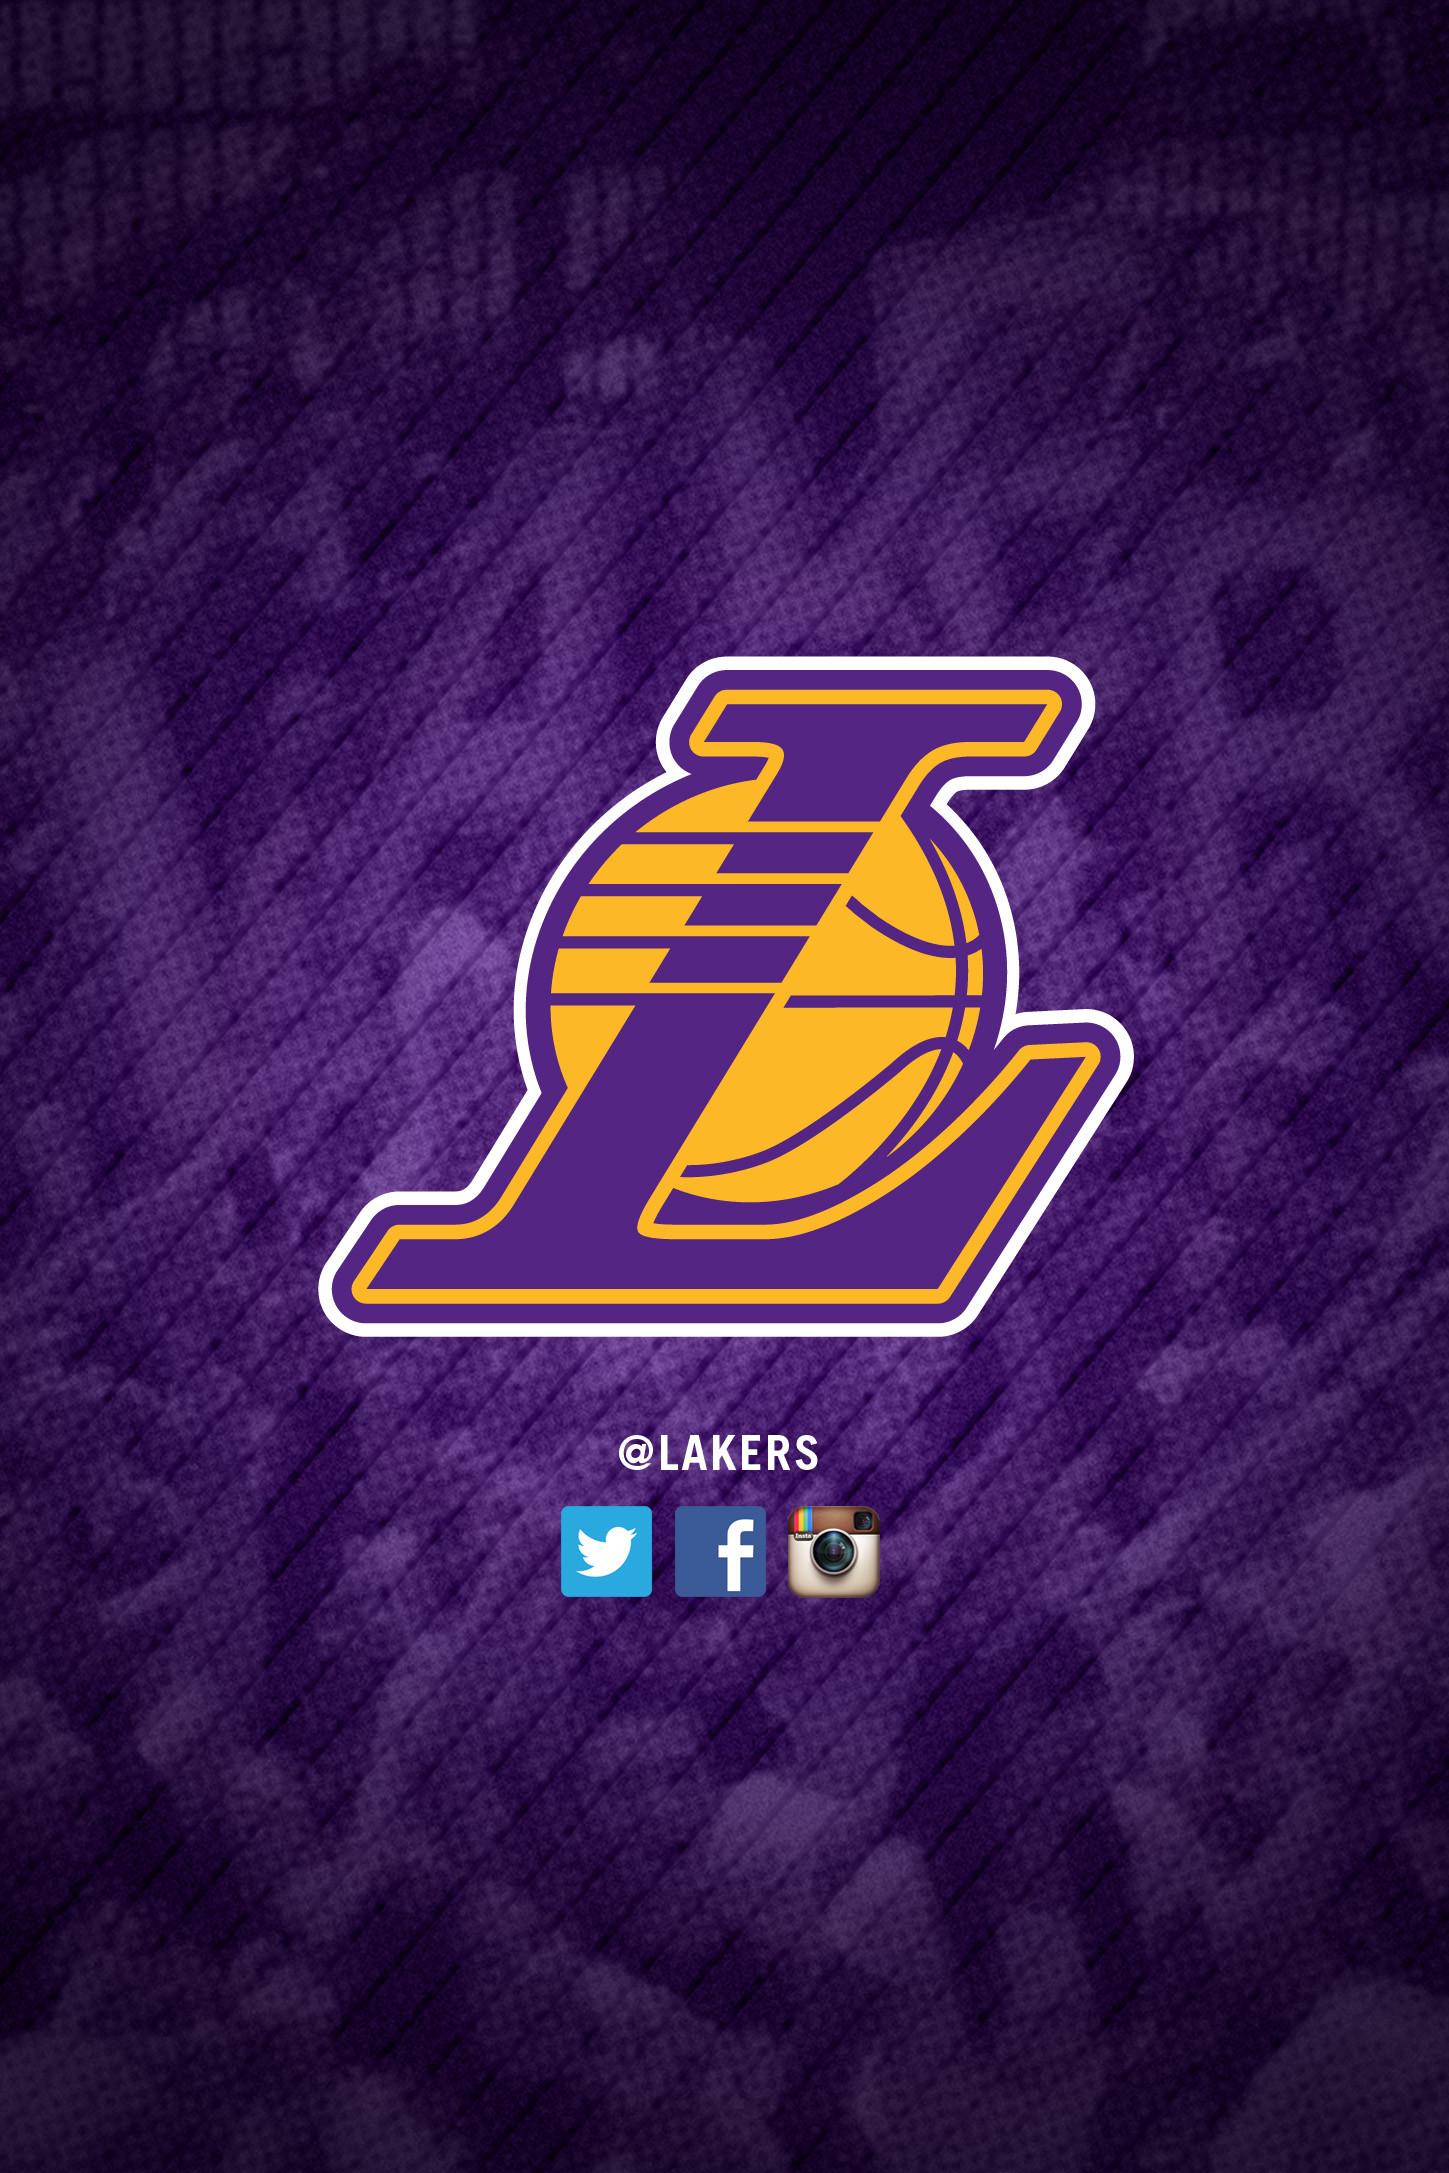 Lakers Wallpaper Ipad Mini – Live Wallpaper HD